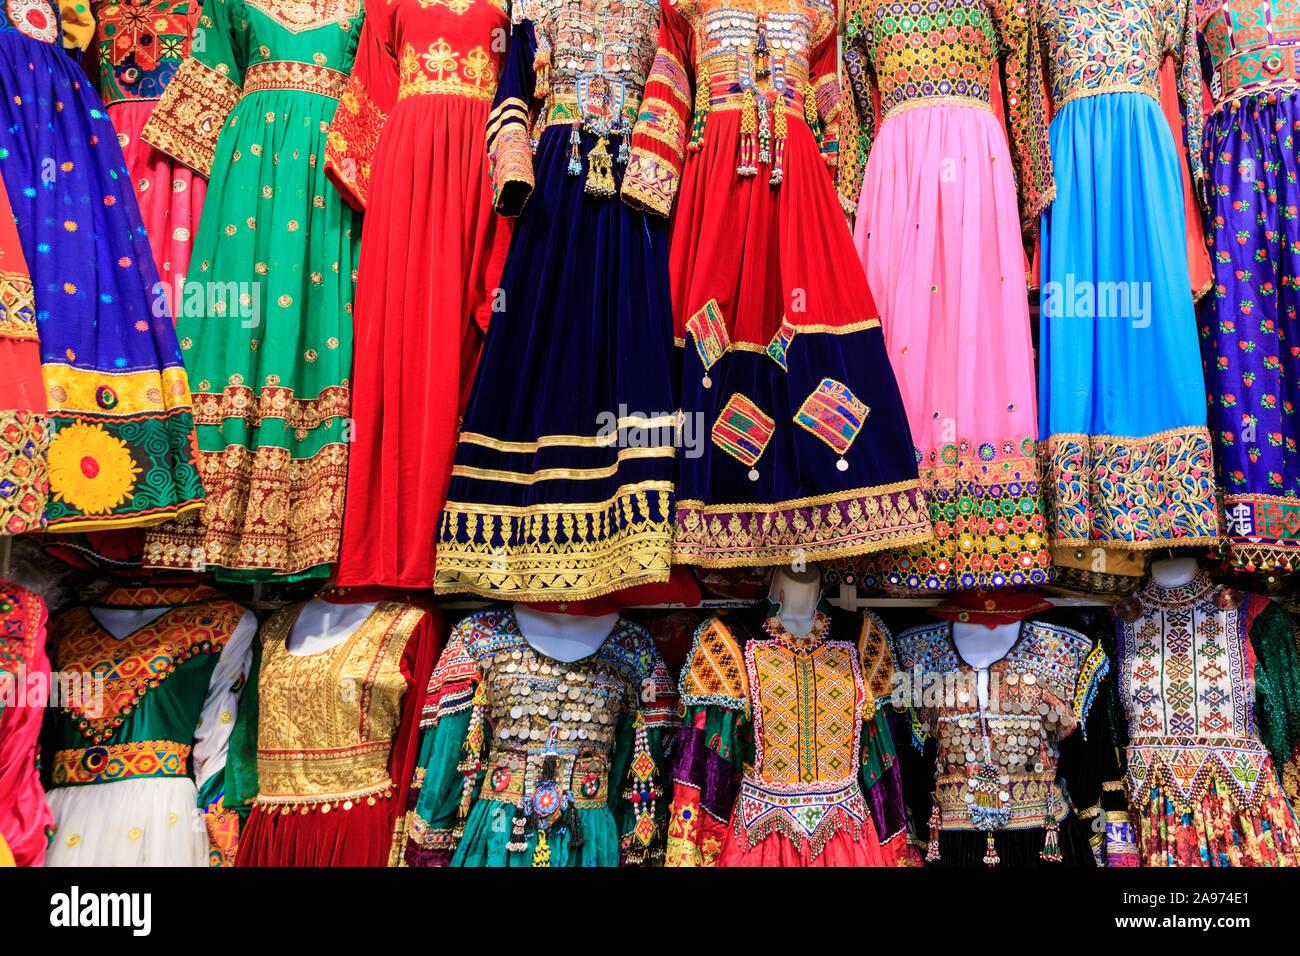 afghan traditional dress stockfotos und -bilder kaufen - alamy